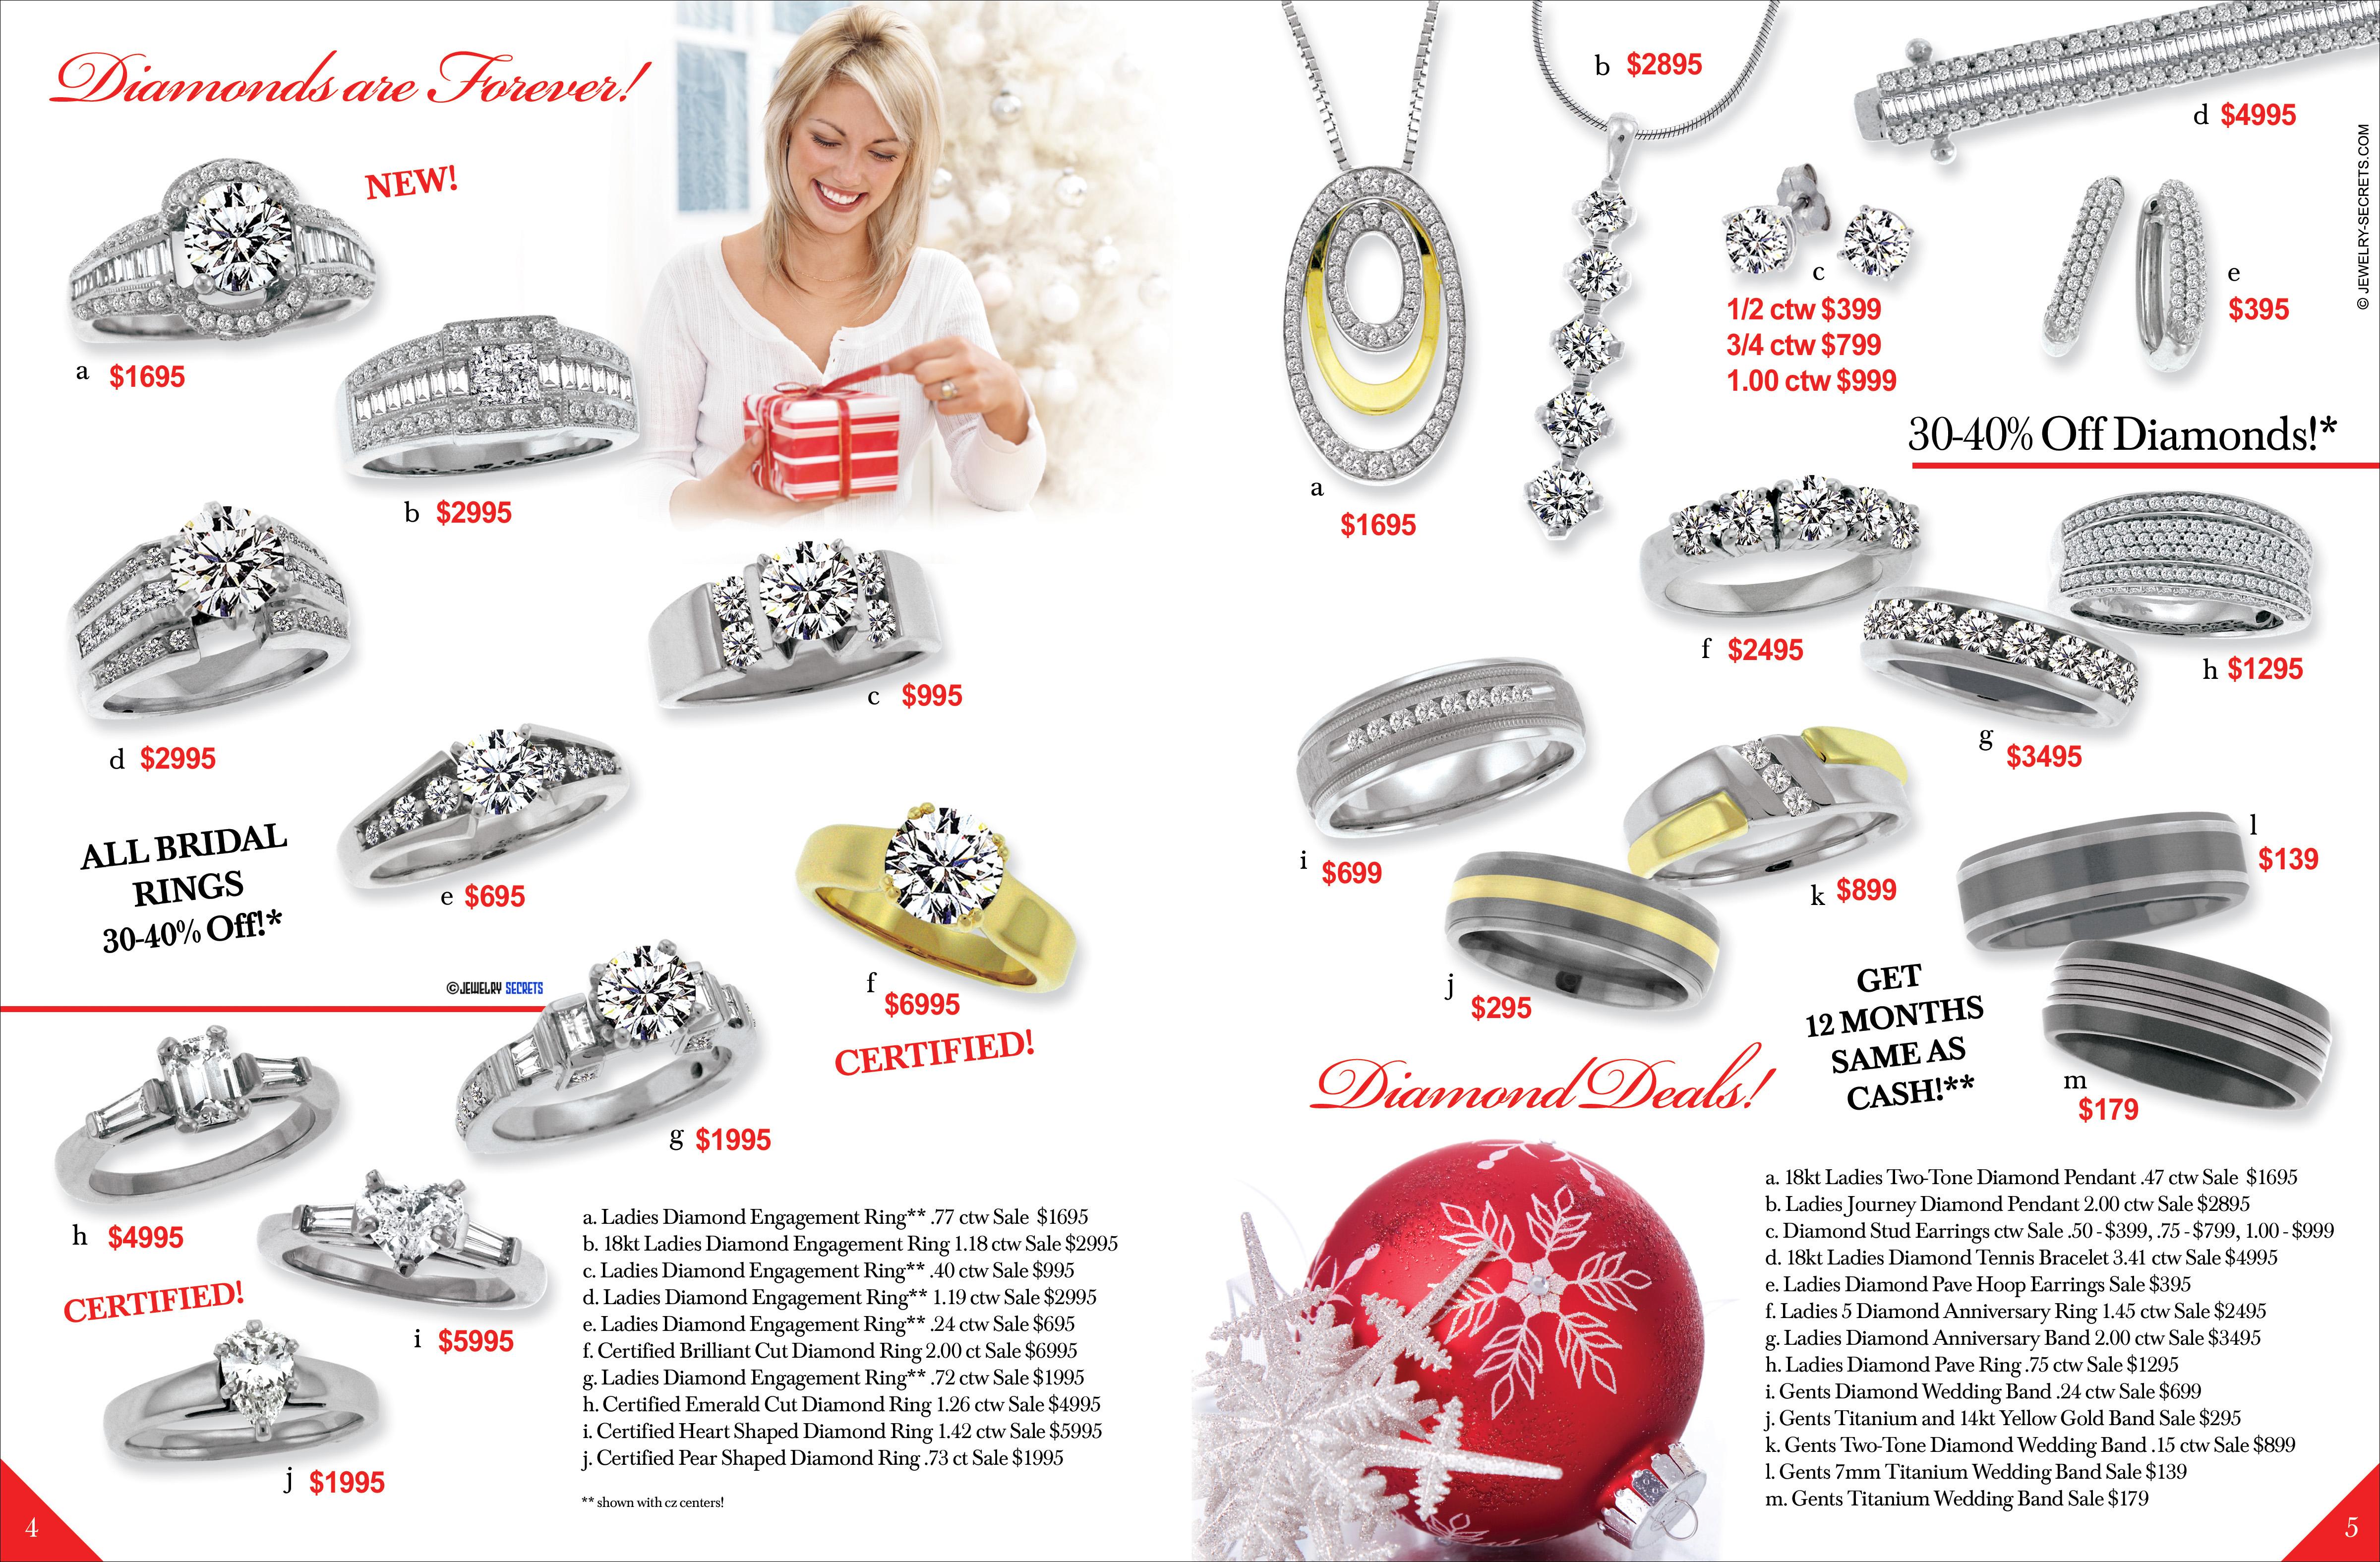 christmas catalog centerfold sample advertisement jewelry secrets